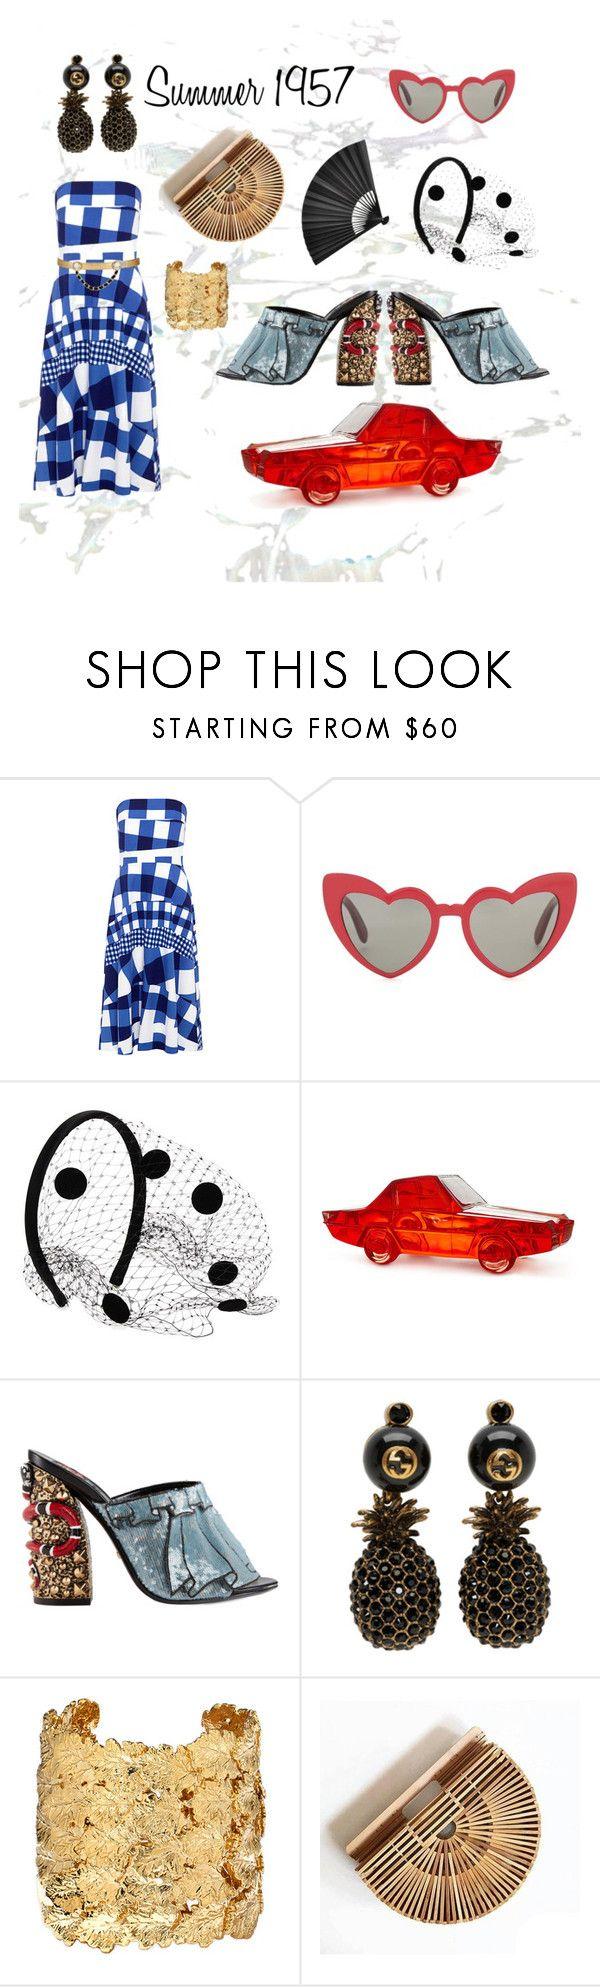 """Summer Trend: Gingham Look 3"" by eliebanks on Polyvore featuring Être Cécile, Yves Saint Laurent, Valentino, Jonathan Adler, Gucci, Aurélie Bidermann and Maison Mayle"